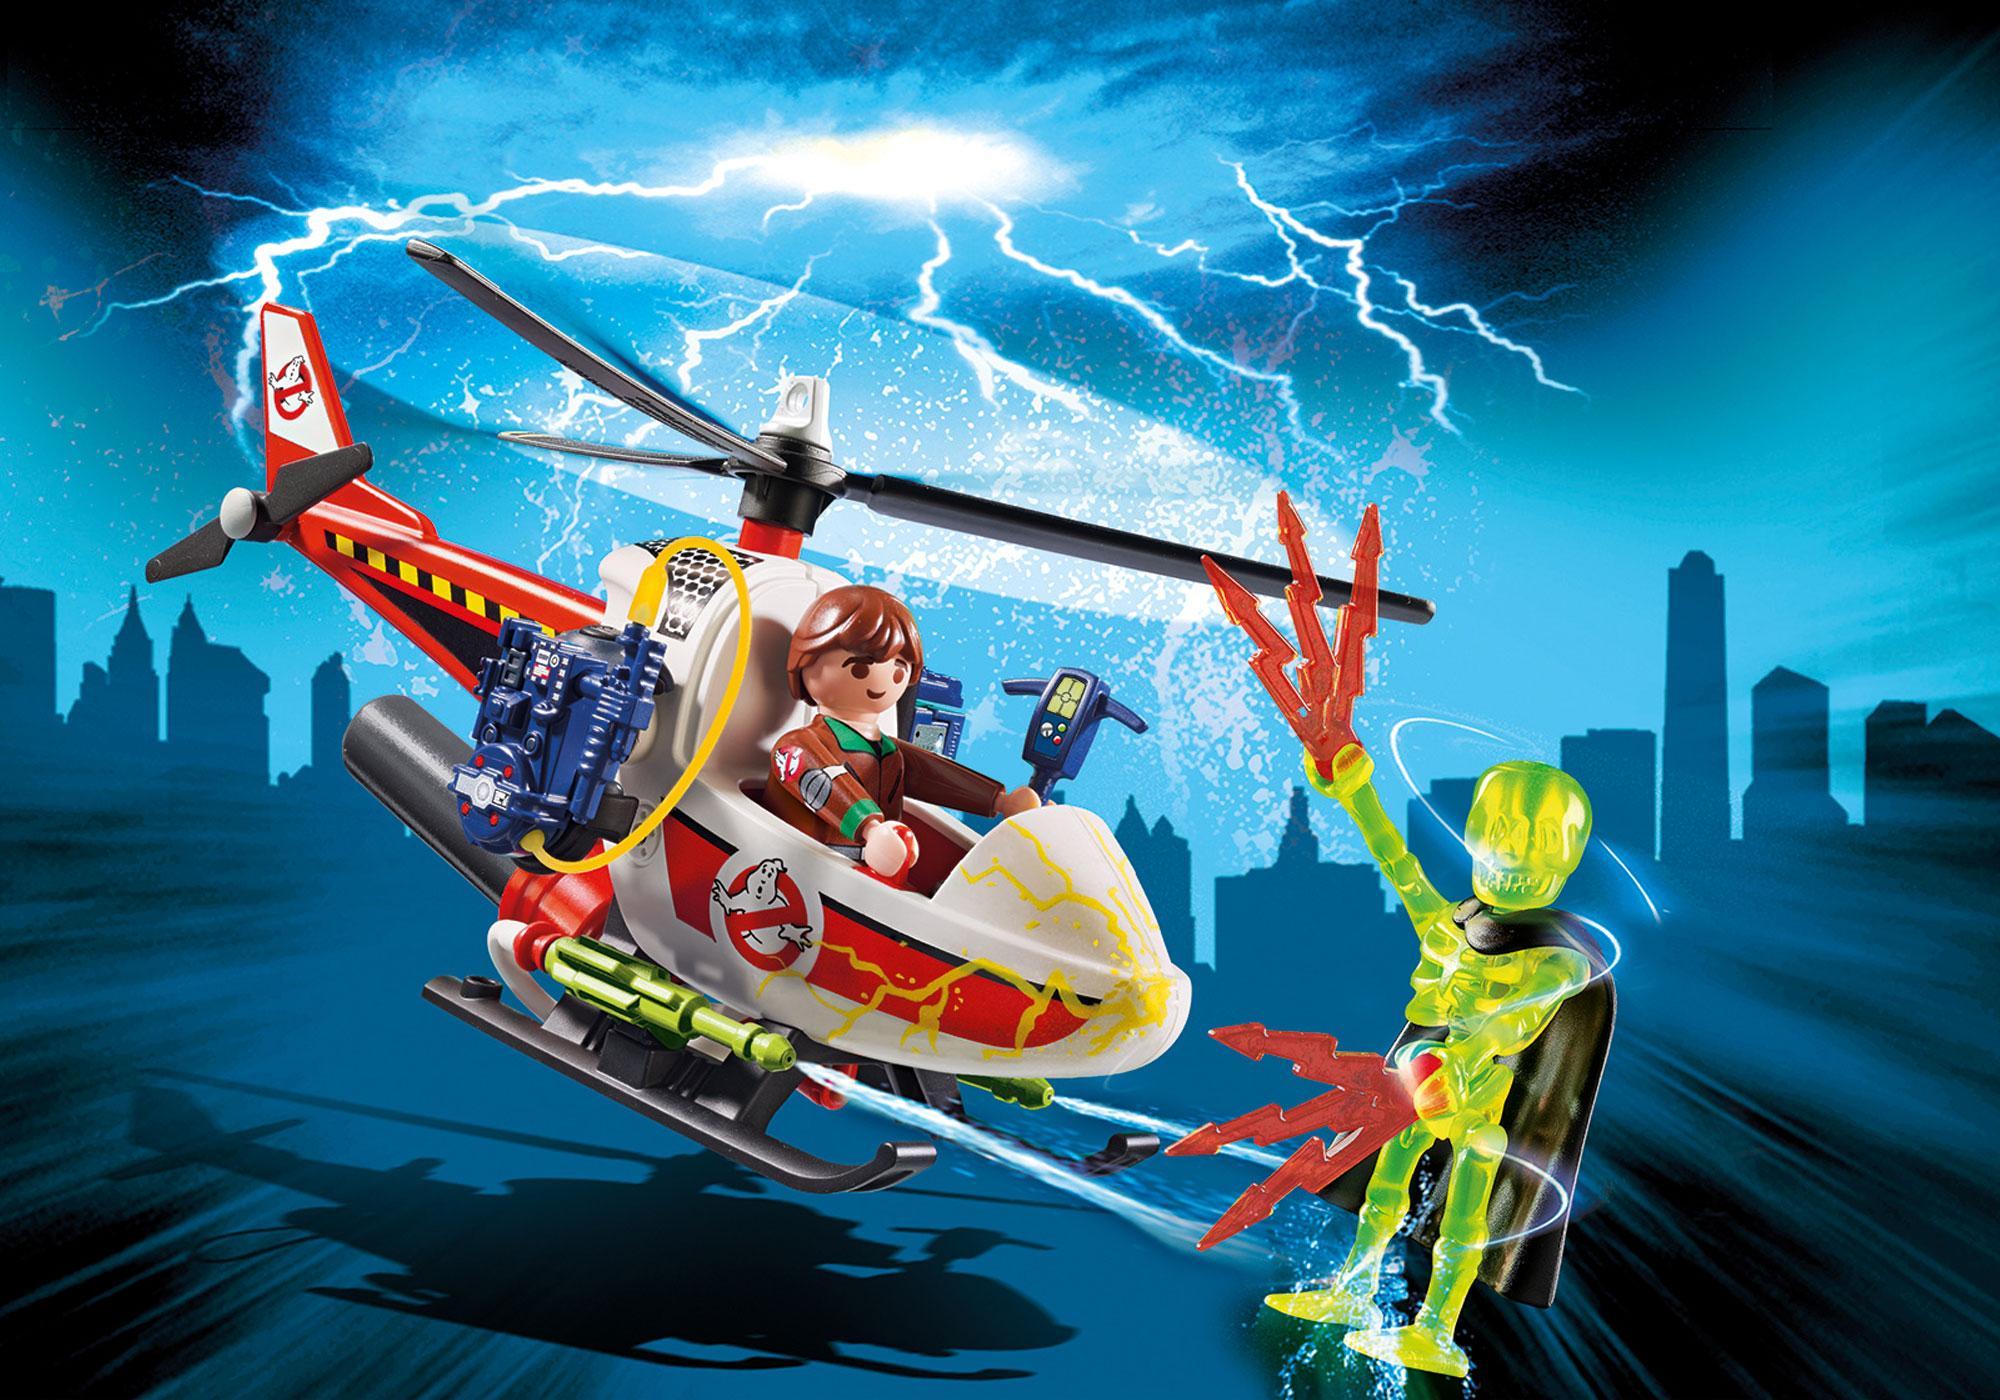 9385_product_detail/Venkman met helikopter